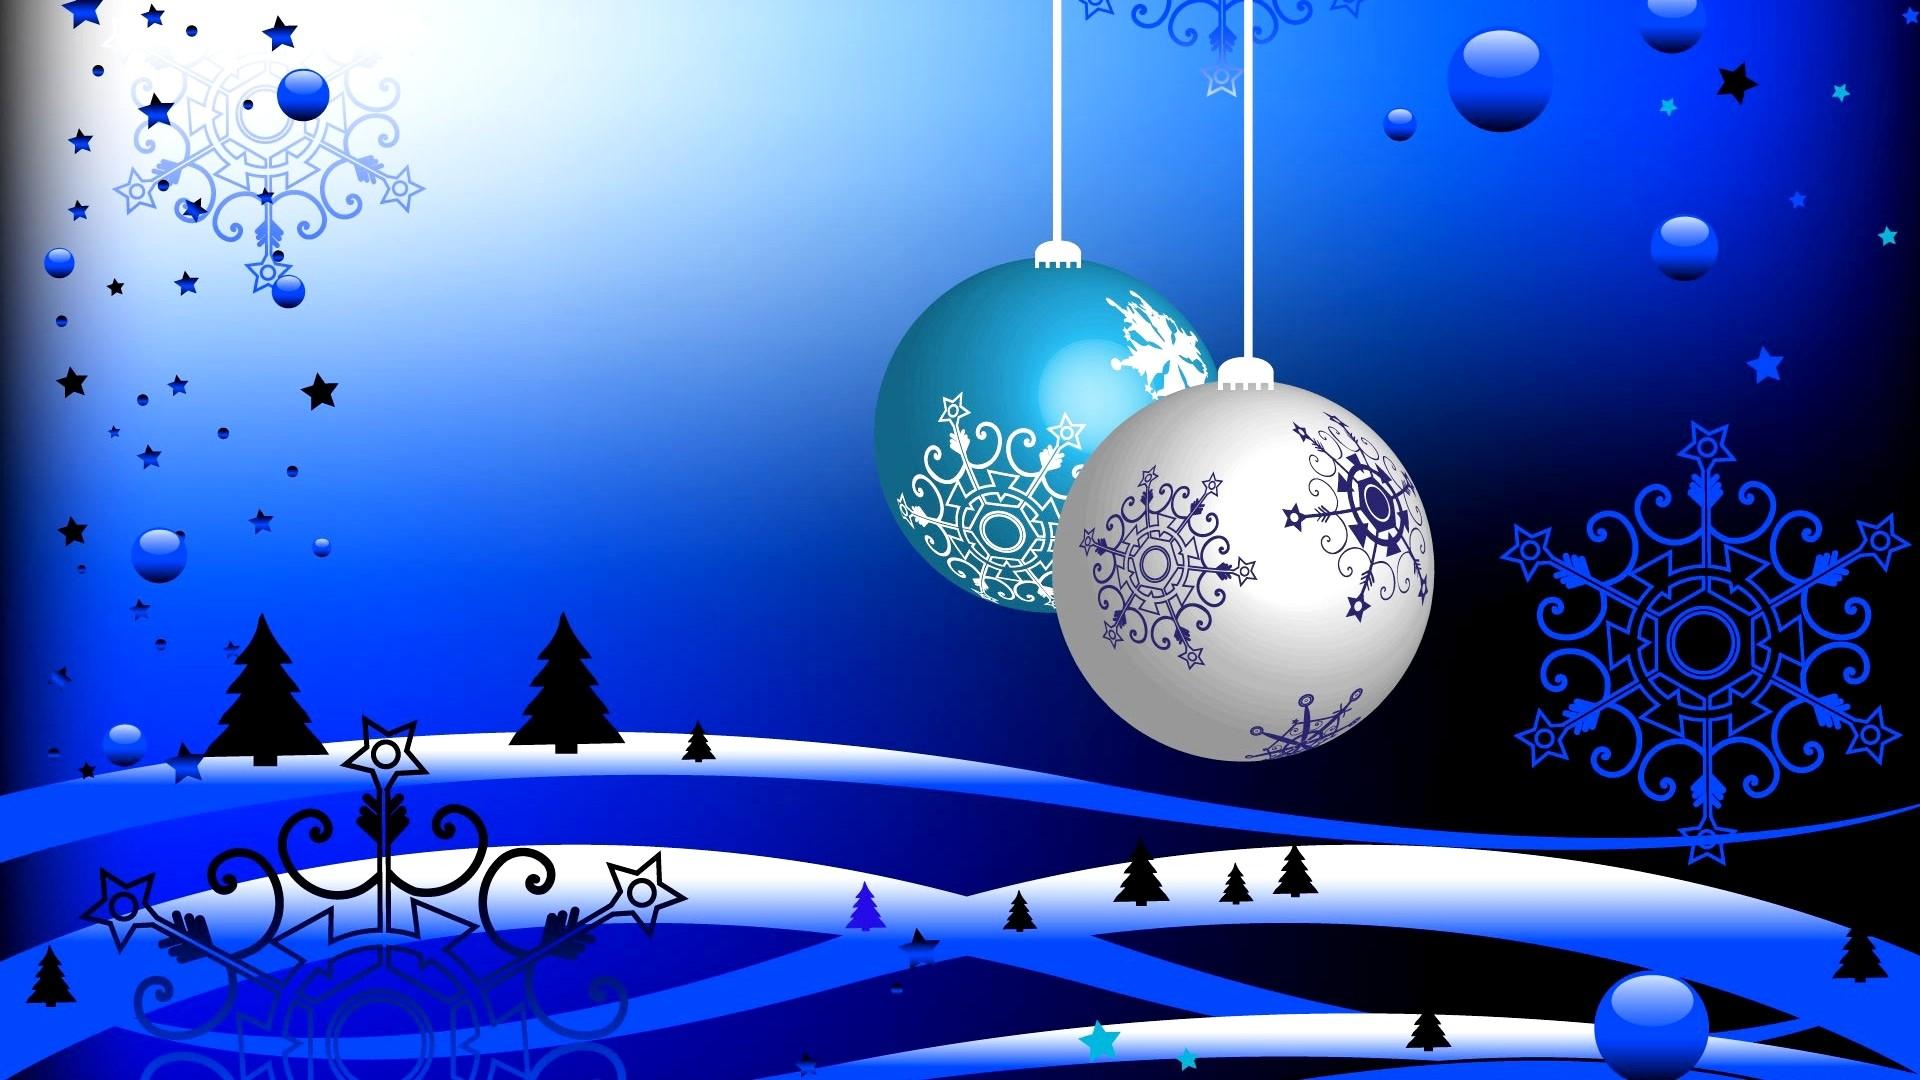 Animated Christmas Desktop Backgrounds HD Best HD Desktop .